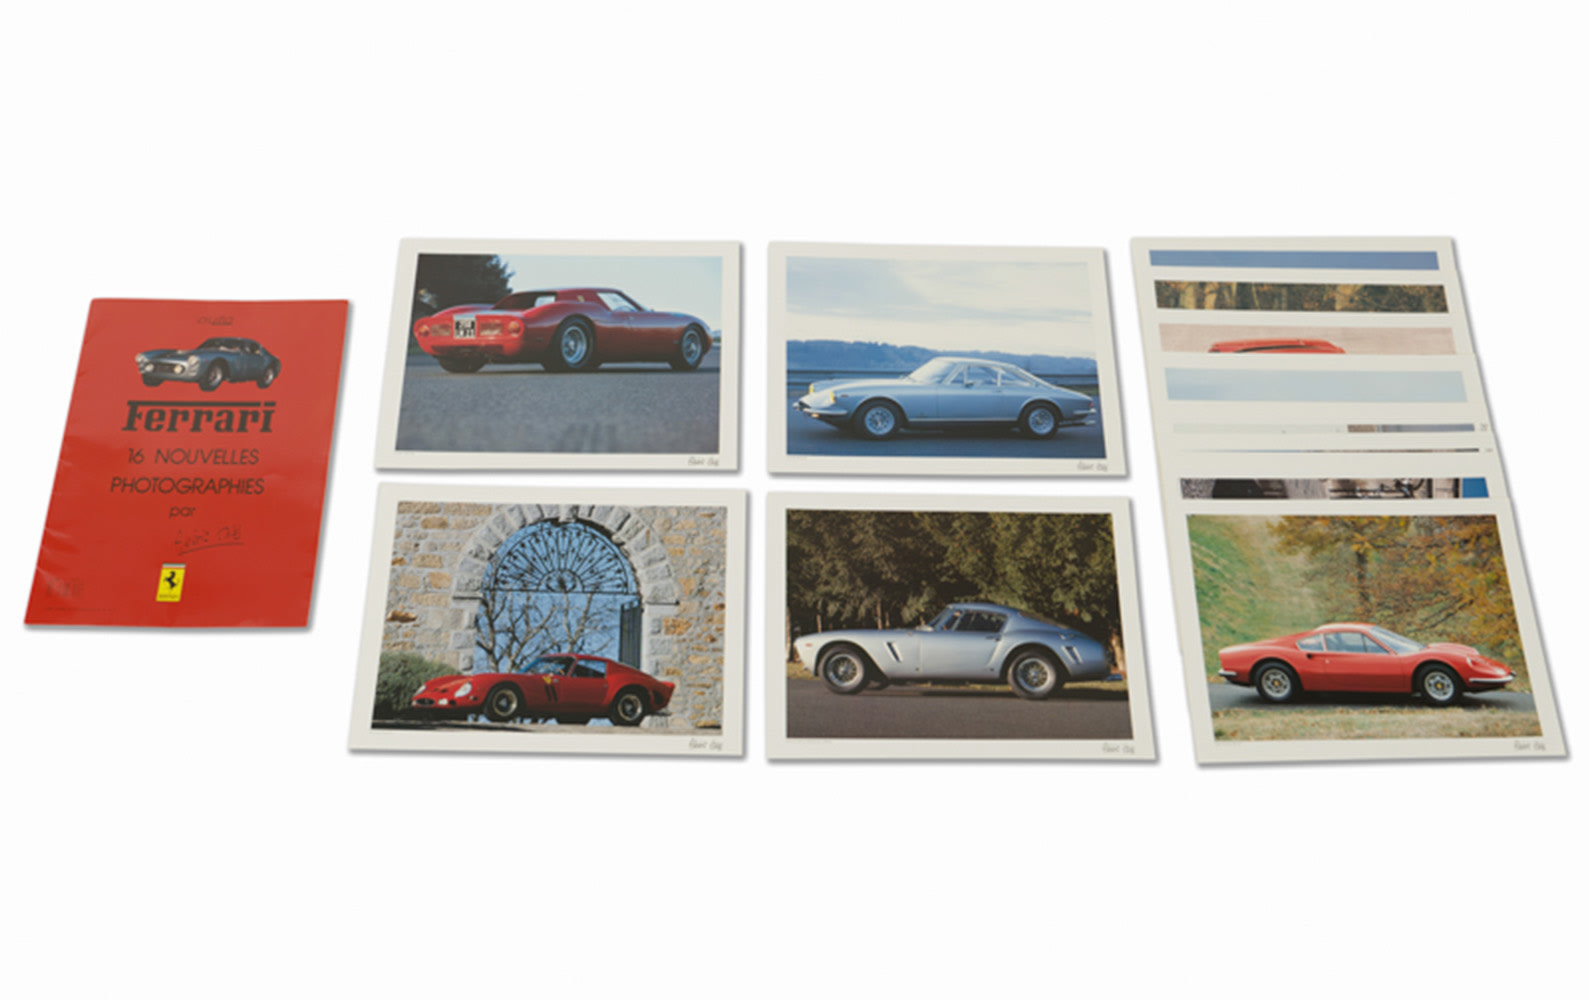 15 Color Photographs of Ferraris by Albéric Haas in Original Folder